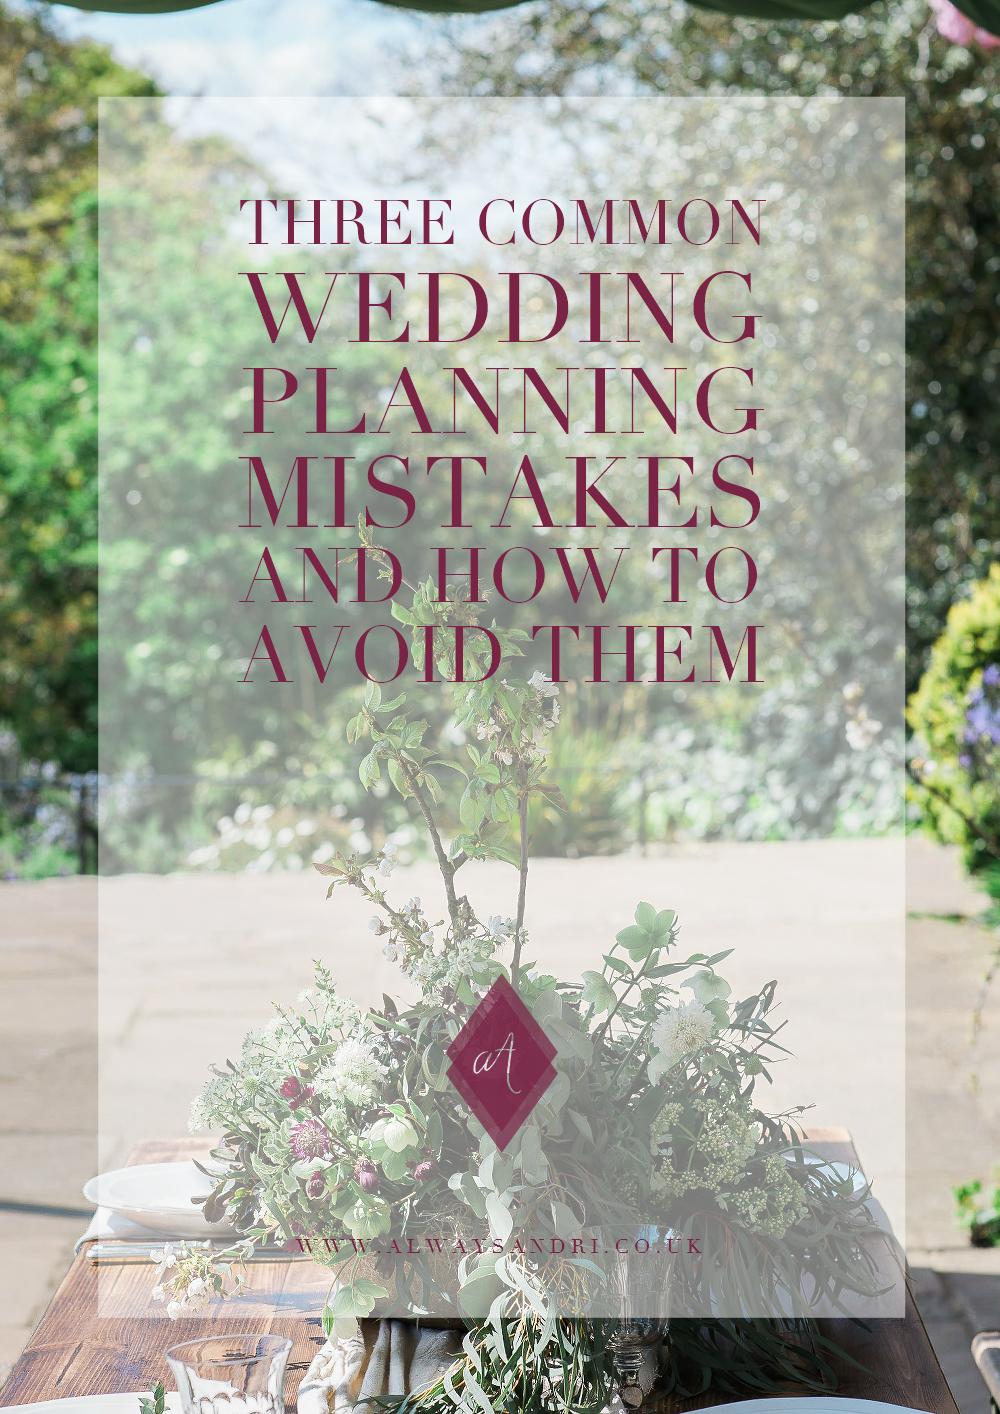 Three-common-wedding-planning-mistakes-how to avoid-them-Always-Andri-Wedding-Design